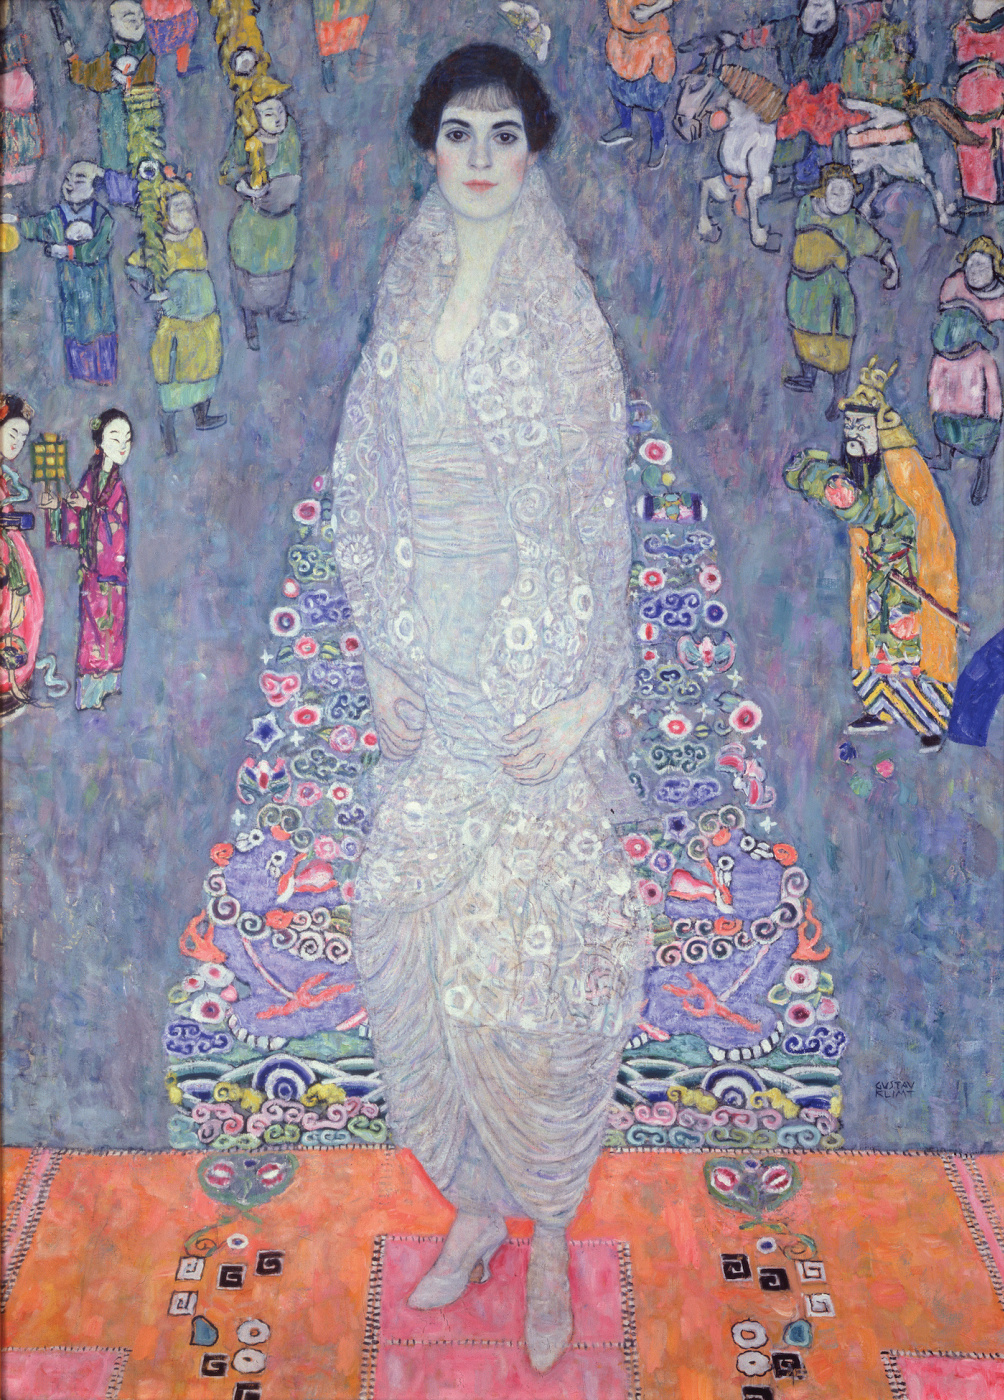 Gustav Klimt. Portrait of Elisabeth Lederer (Baroness Elizabeth Bachofen-Echt)